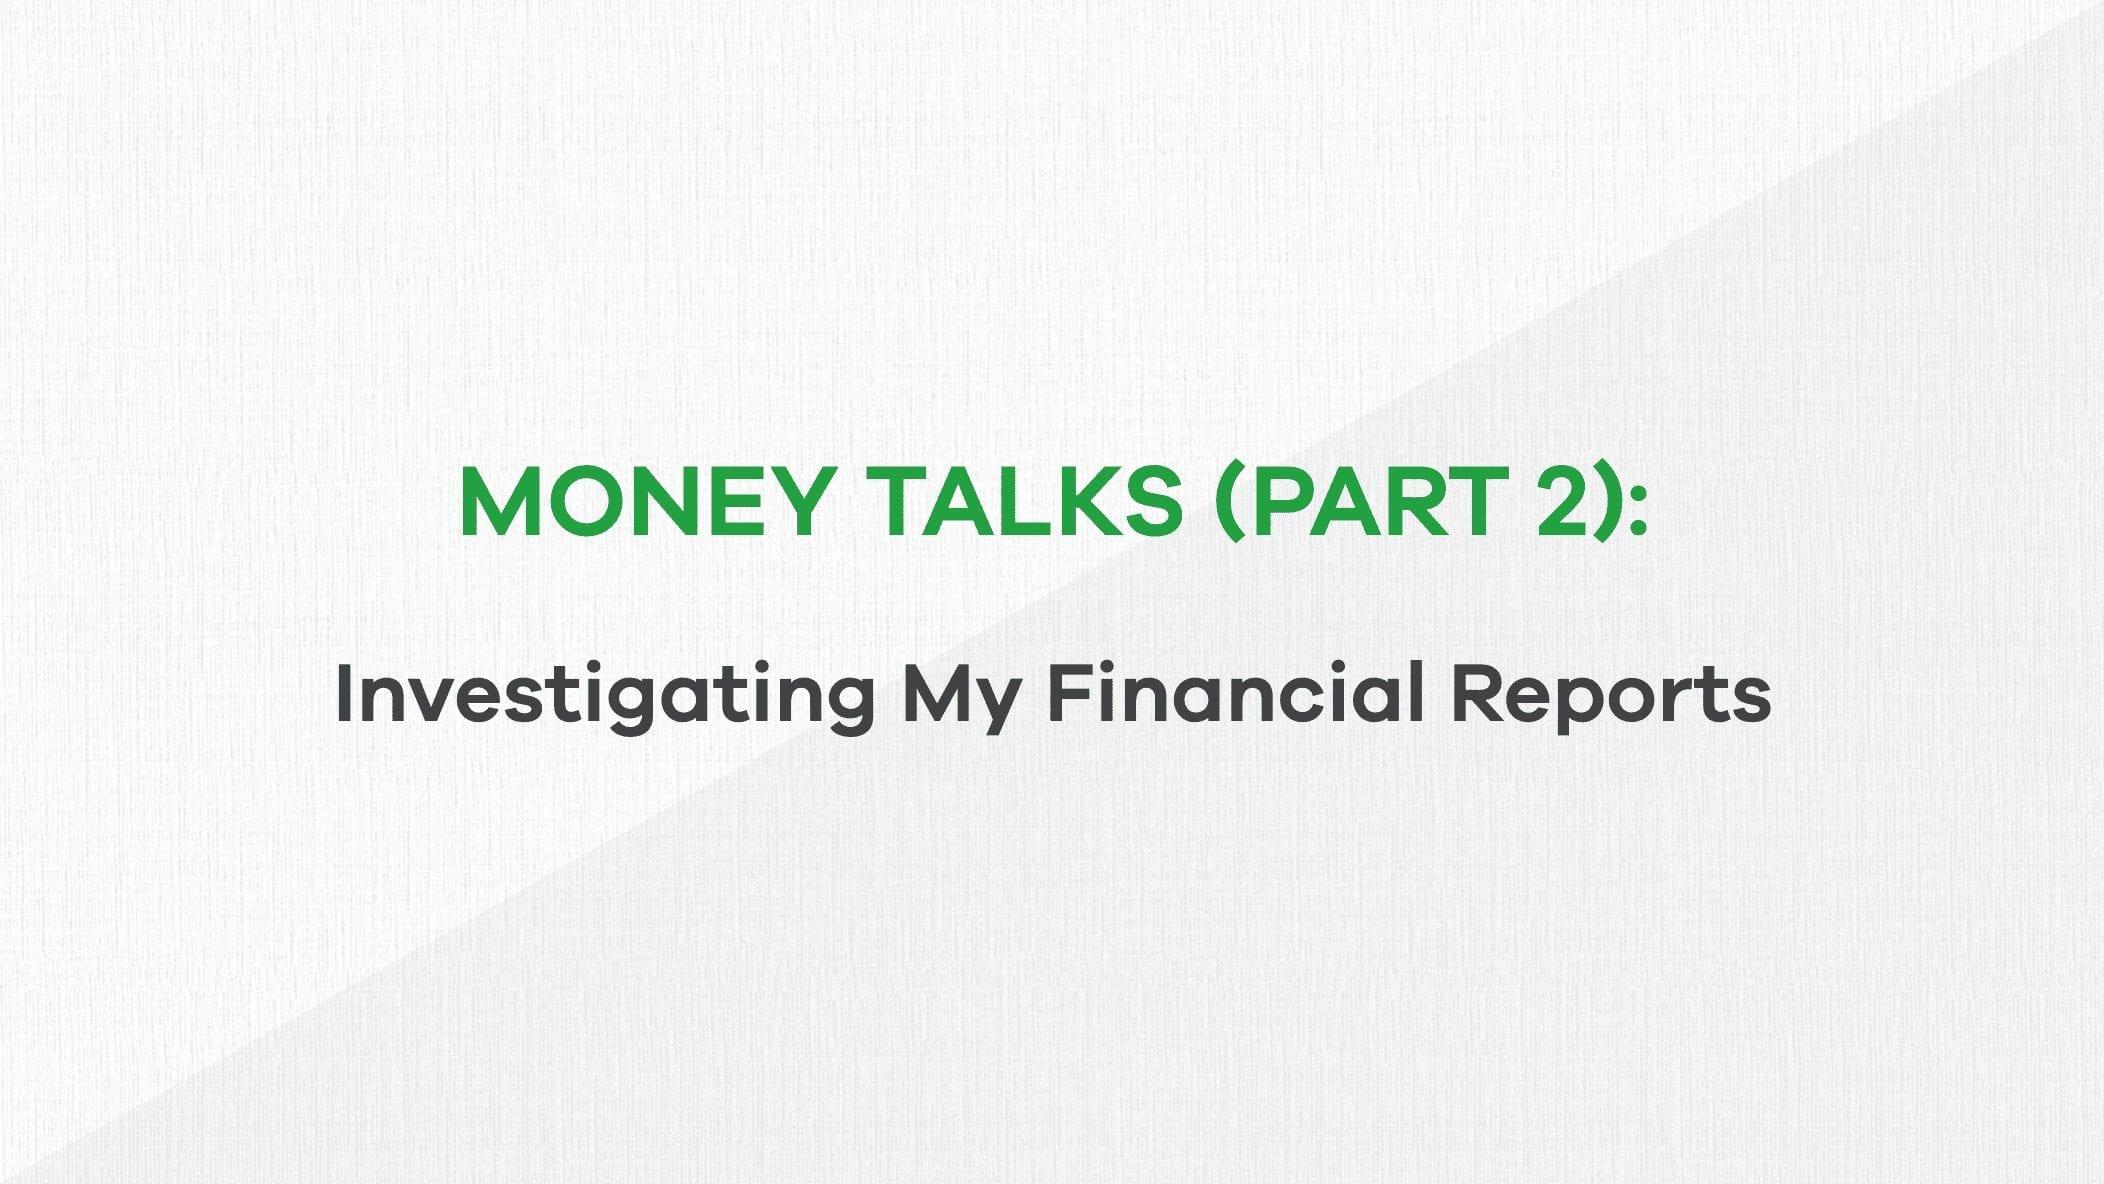 money talks part 2 - investigating financial reports